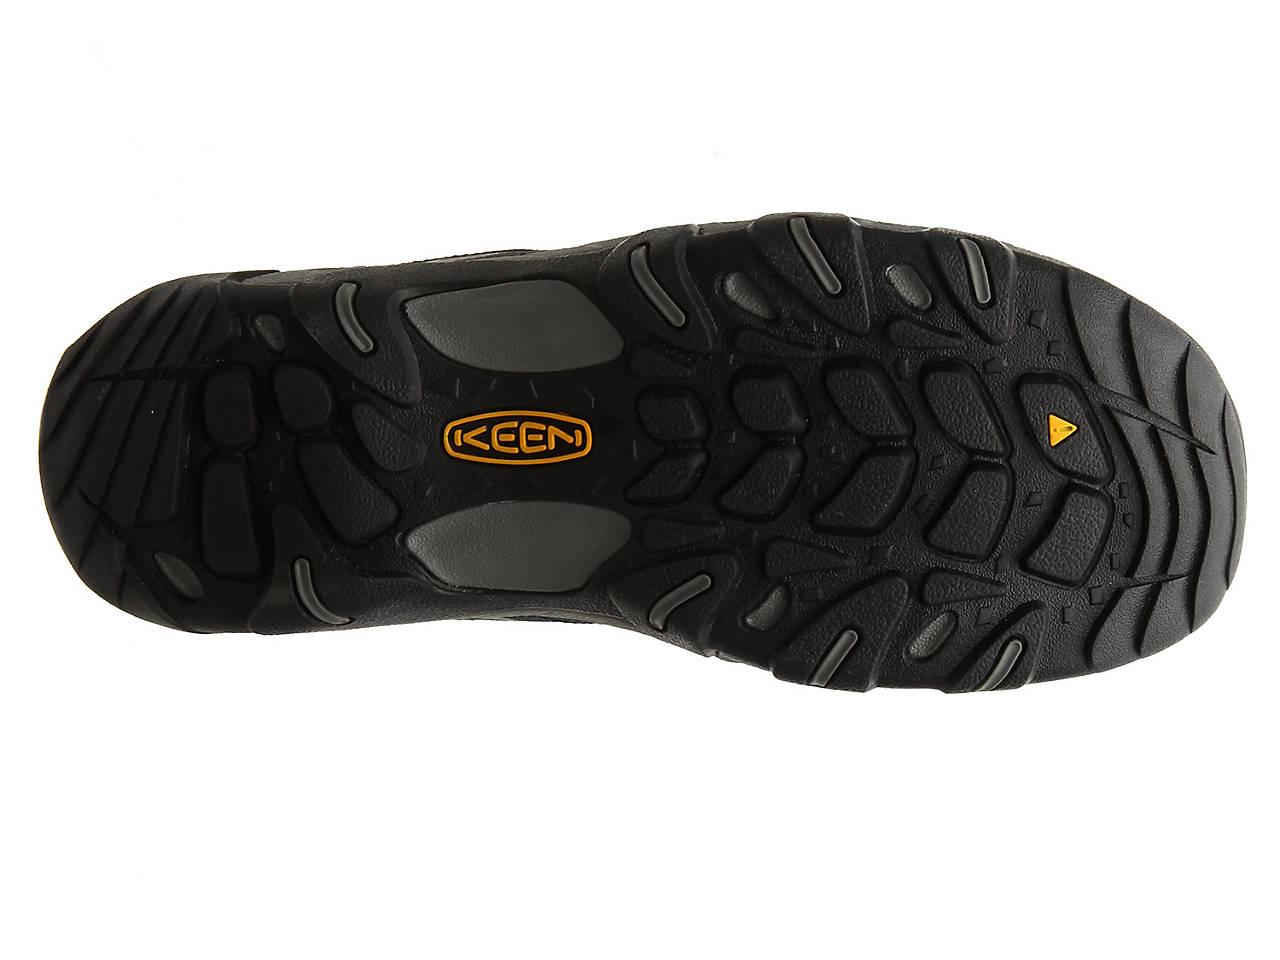 c9d9f716c0ec Keen Oakridge Hiking Shoe Men s Shoes